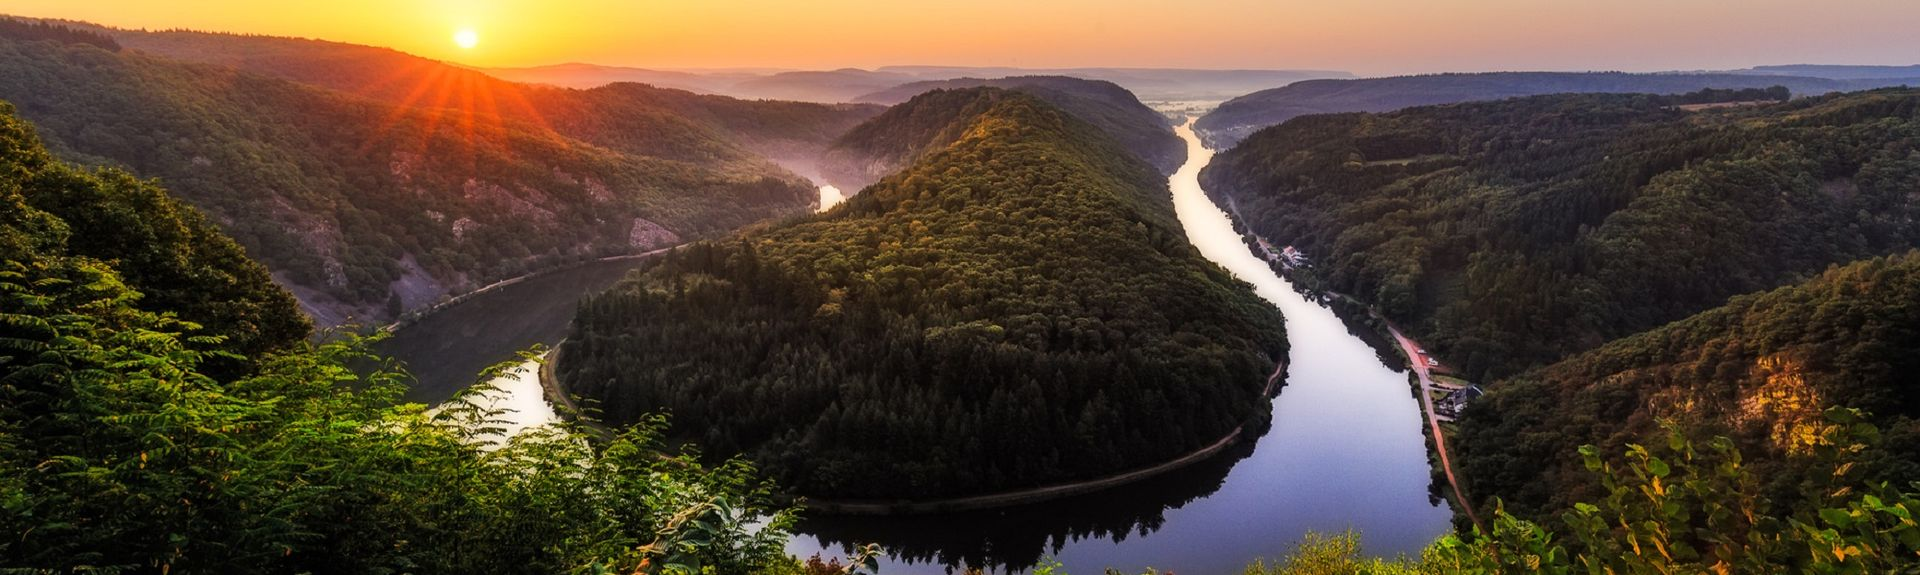 Hahn, Rhineland-Palatinate, Germany